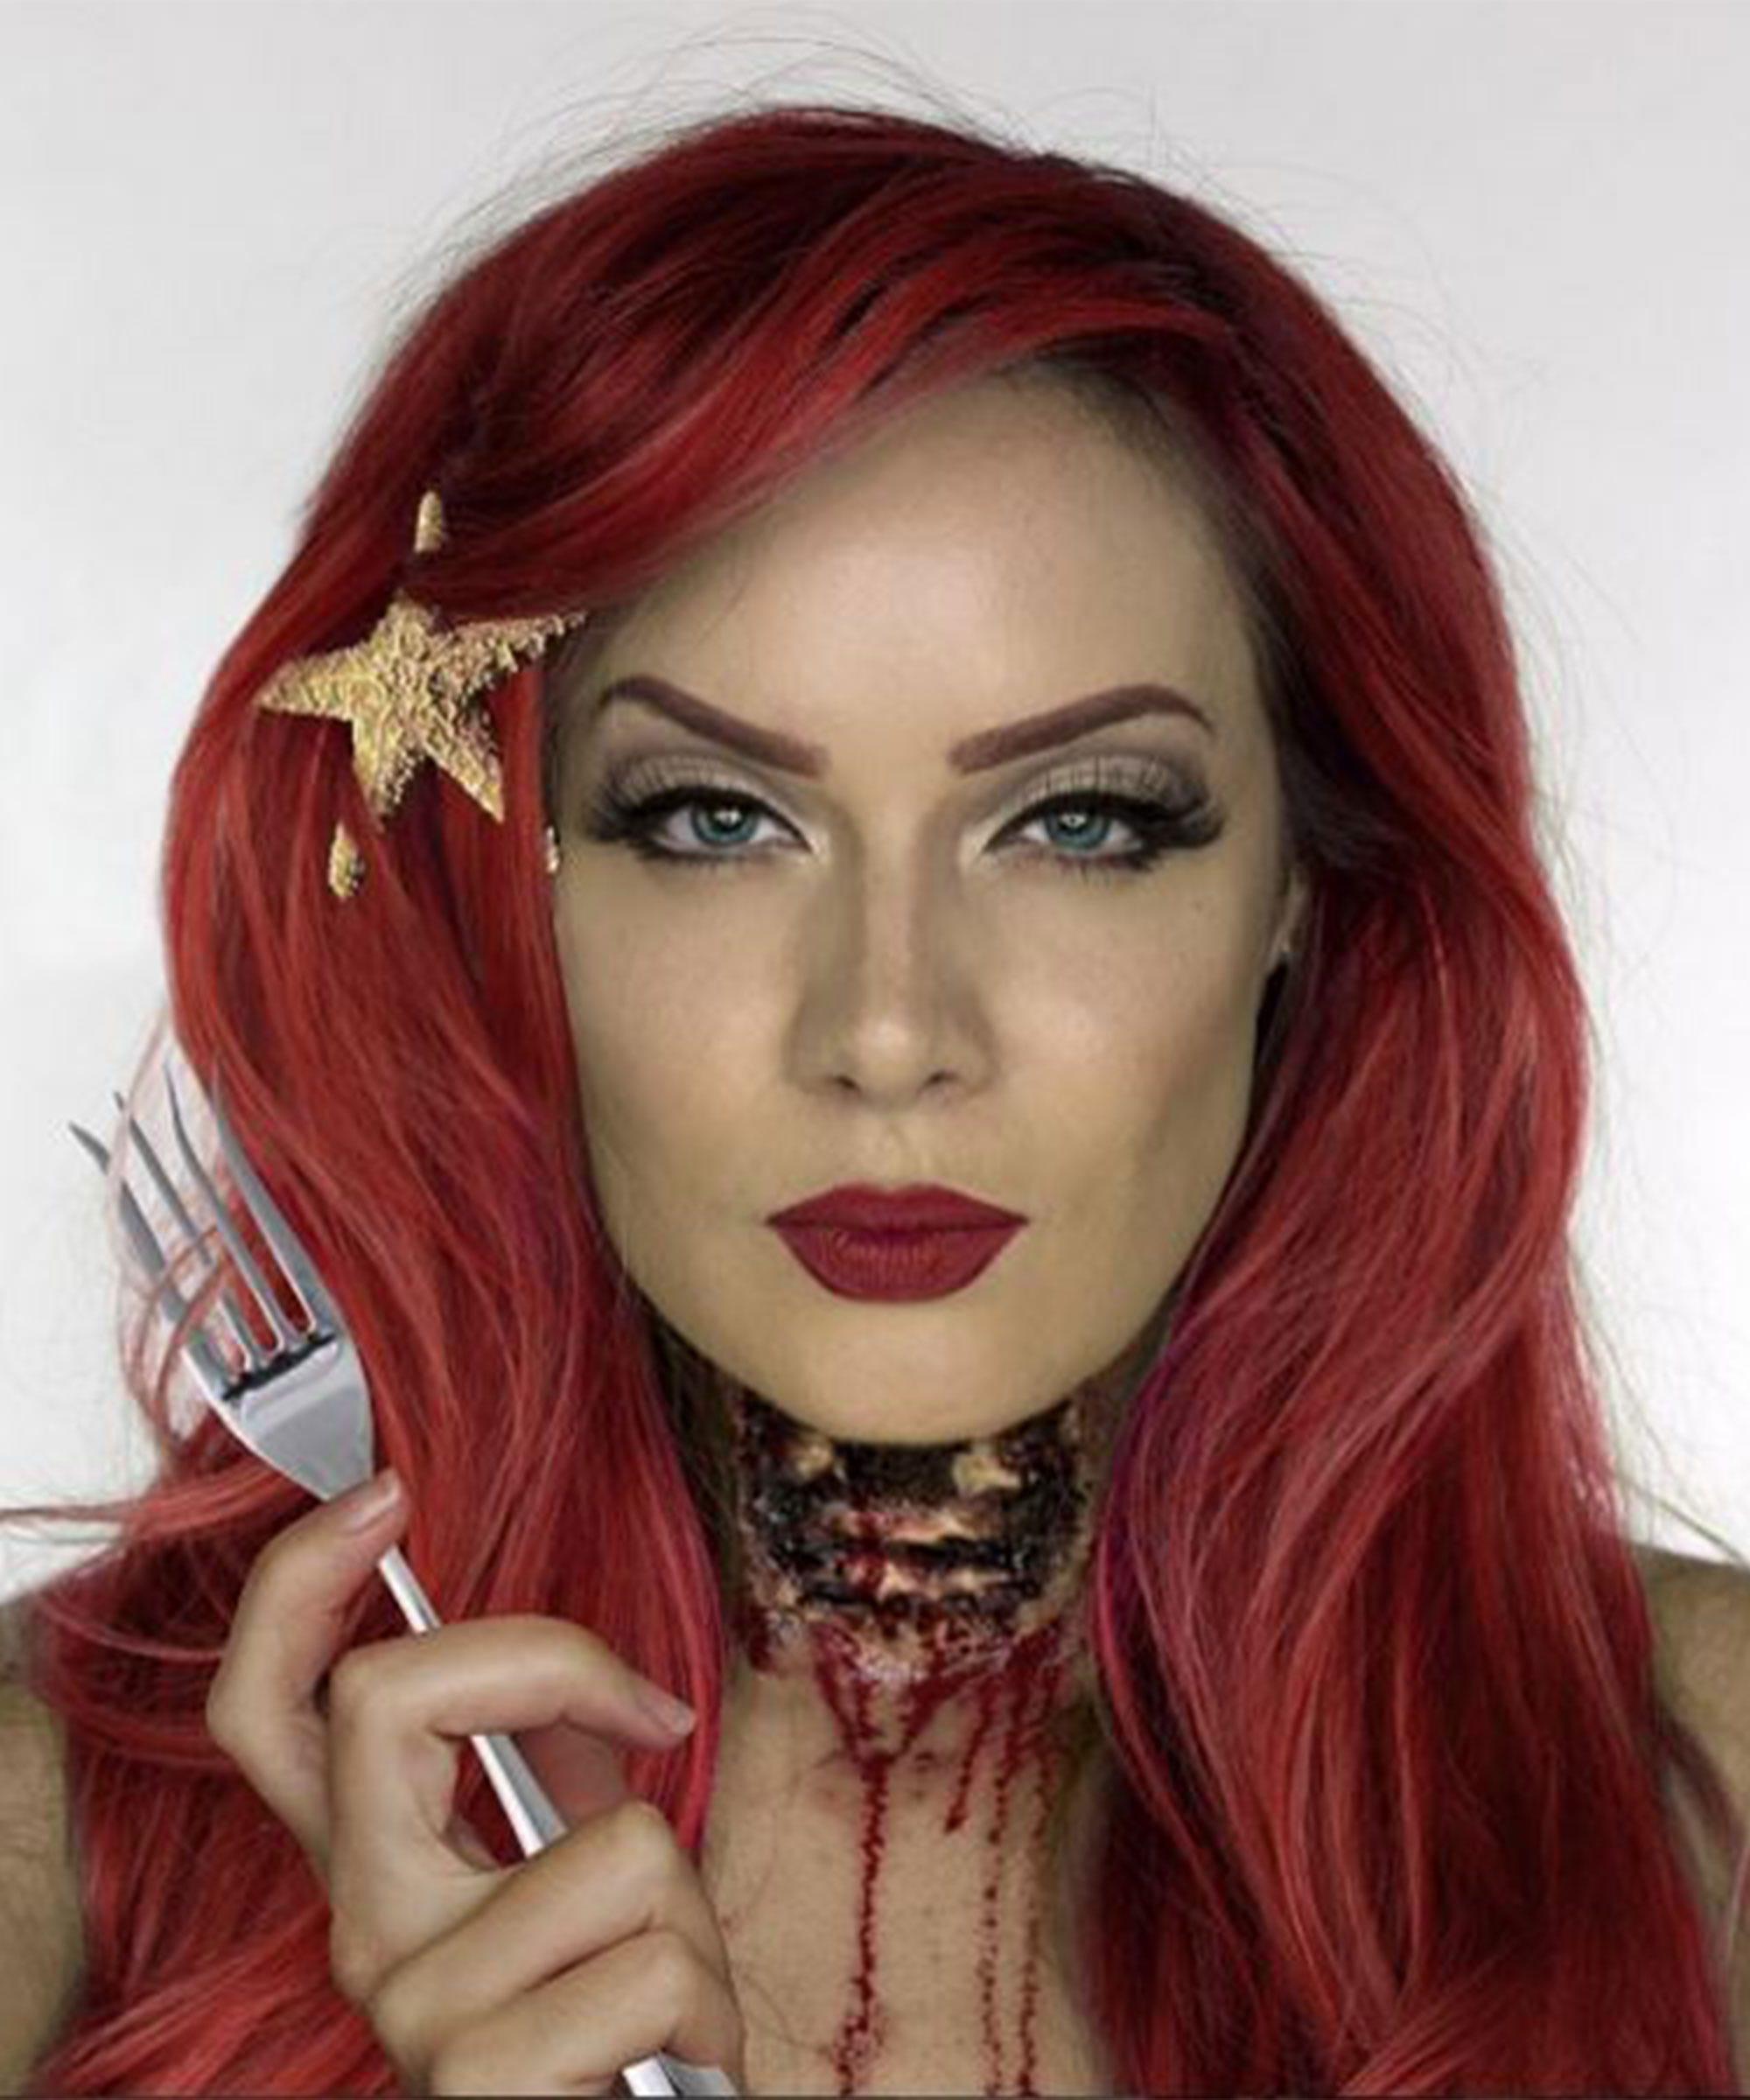 Scary Creepy Fake Blood Instagram Face Photos - Gore-makeup